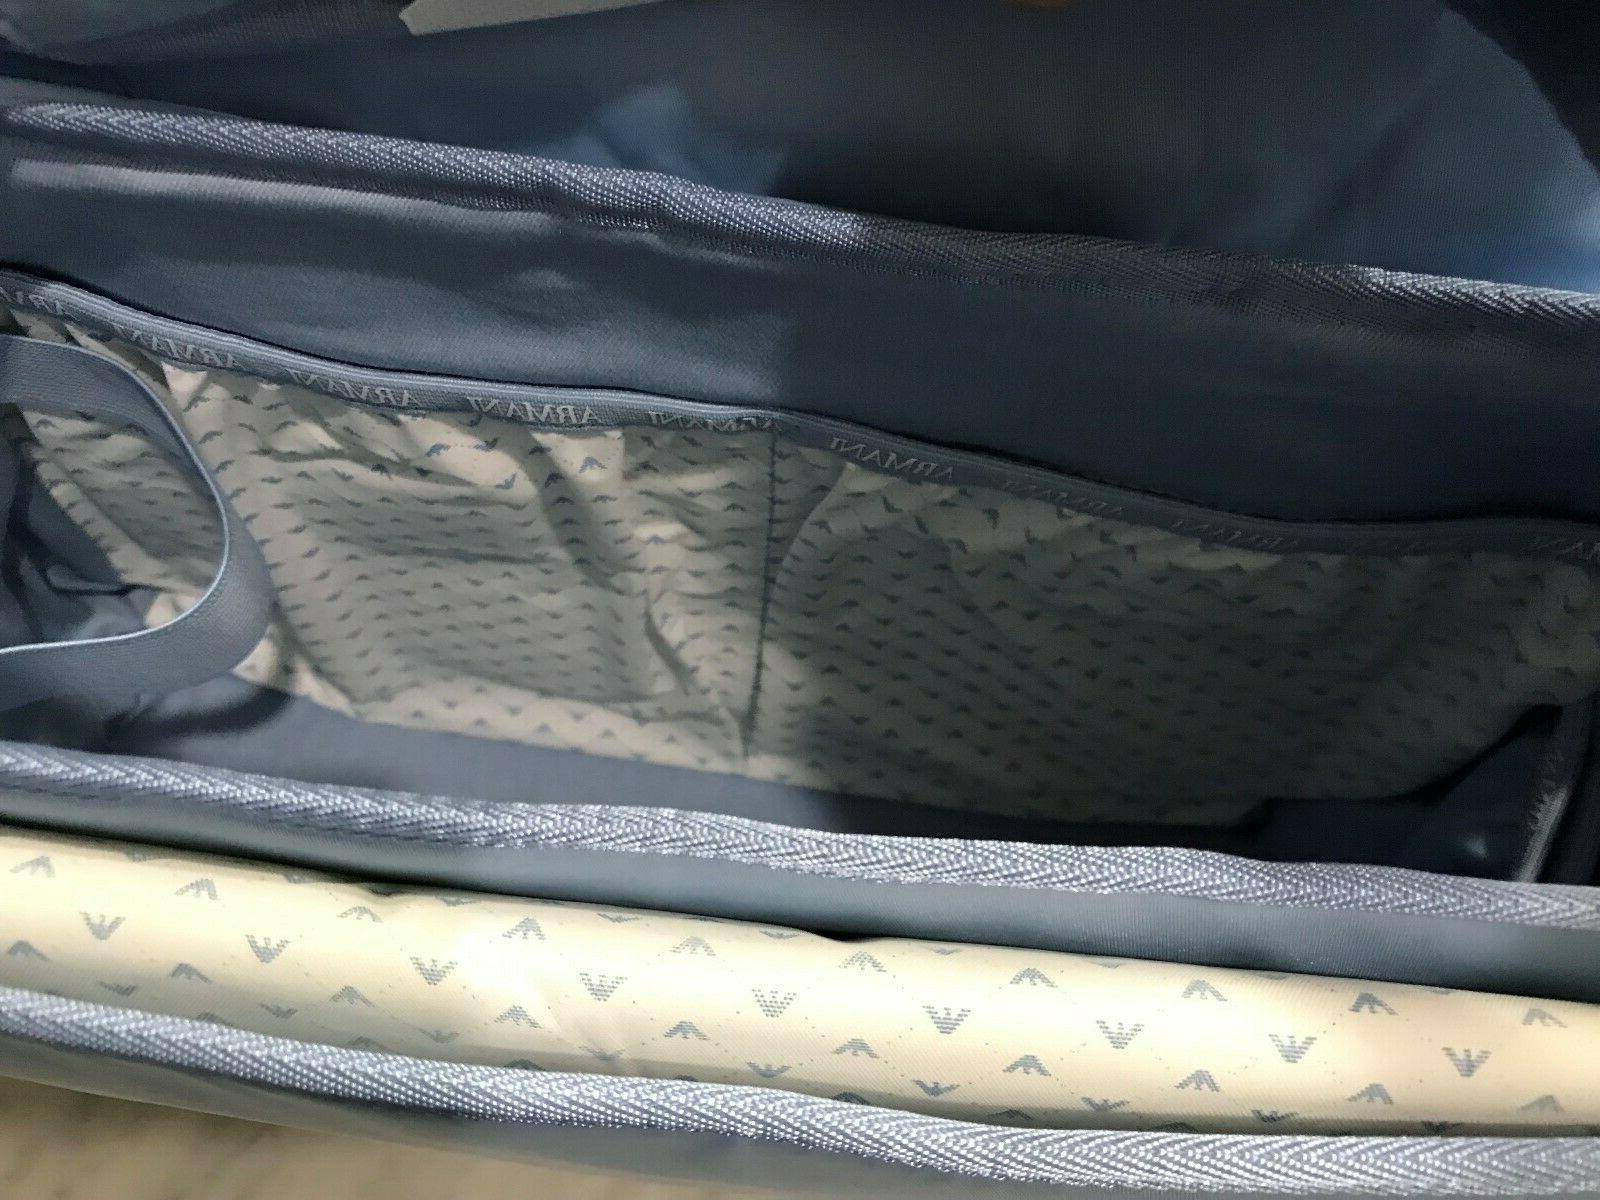 Armani Large Nylon Baby Changing Diaper Bag Messenger Bag $399